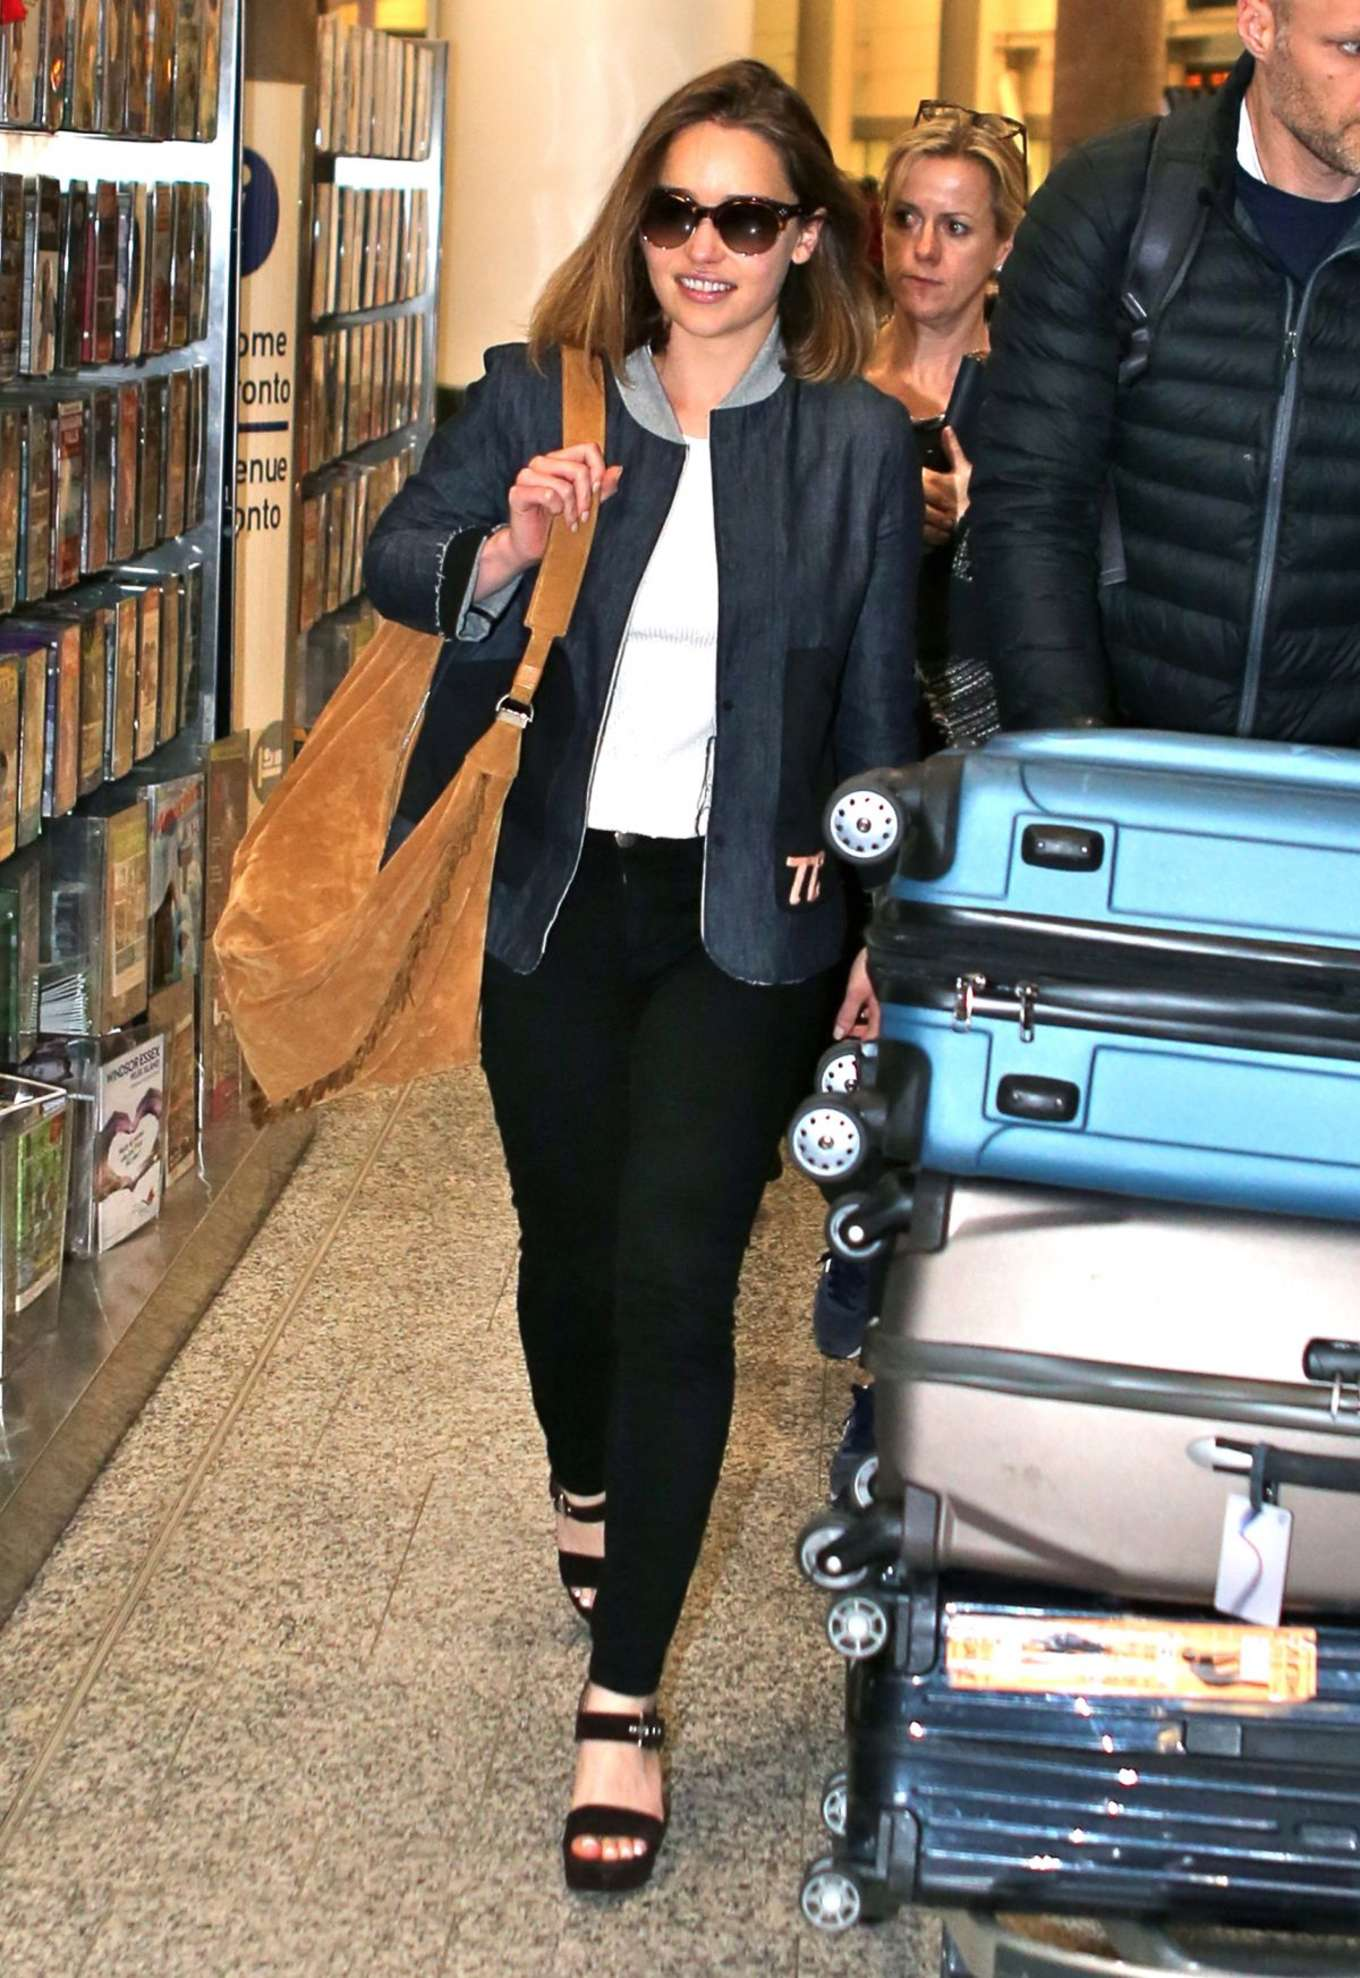 Emilia Clarke at Pearson International Airport in Toronto